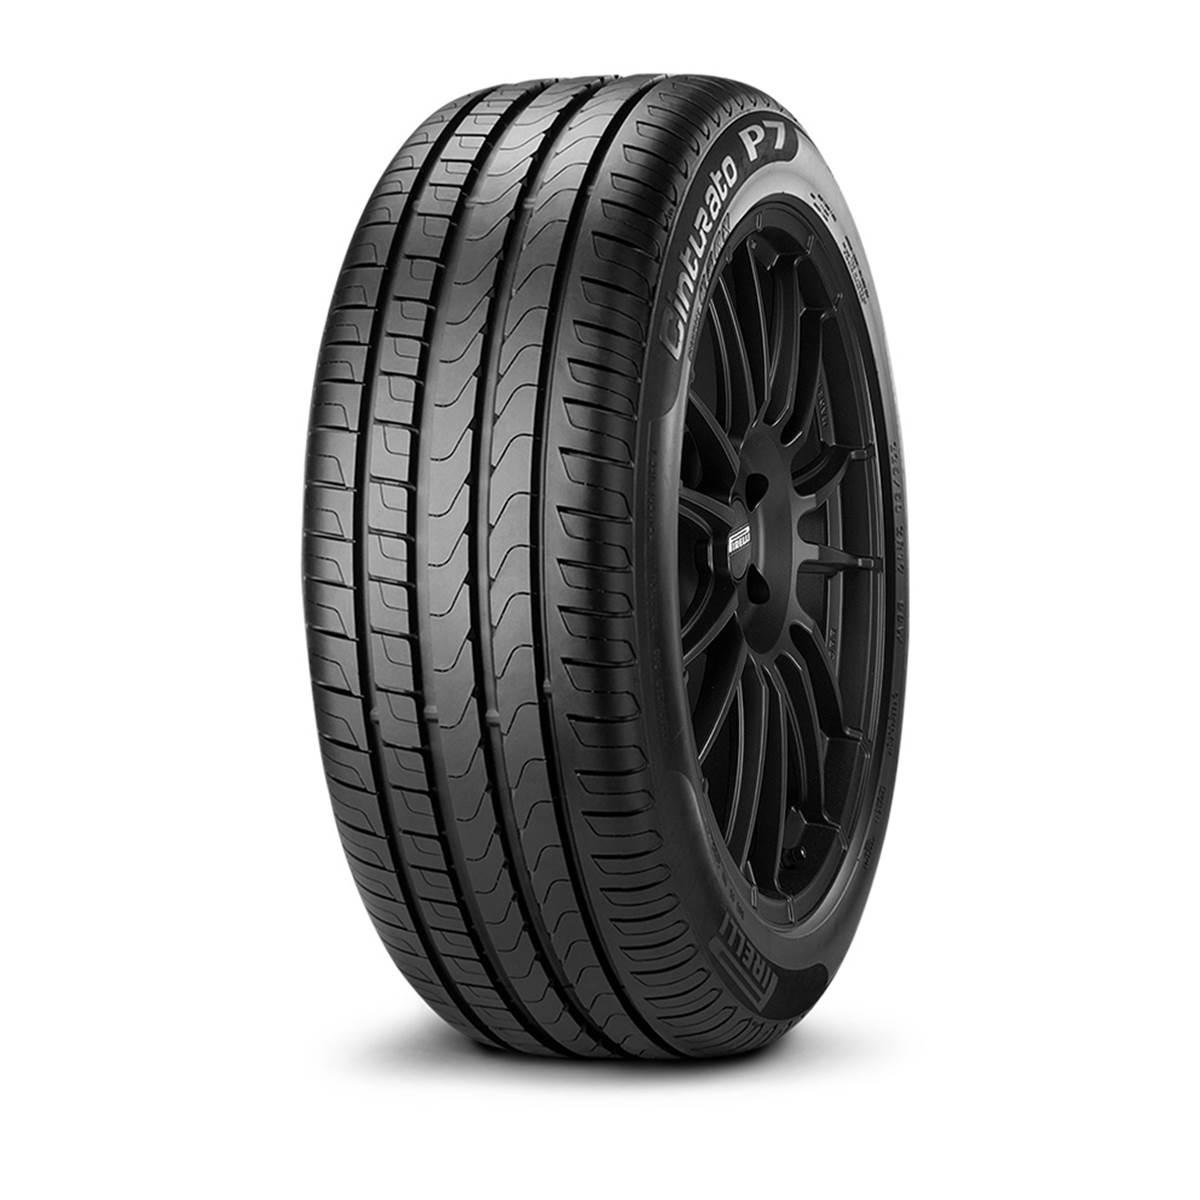 Pneu Pirelli 225/55R17 97W Cinturato P7